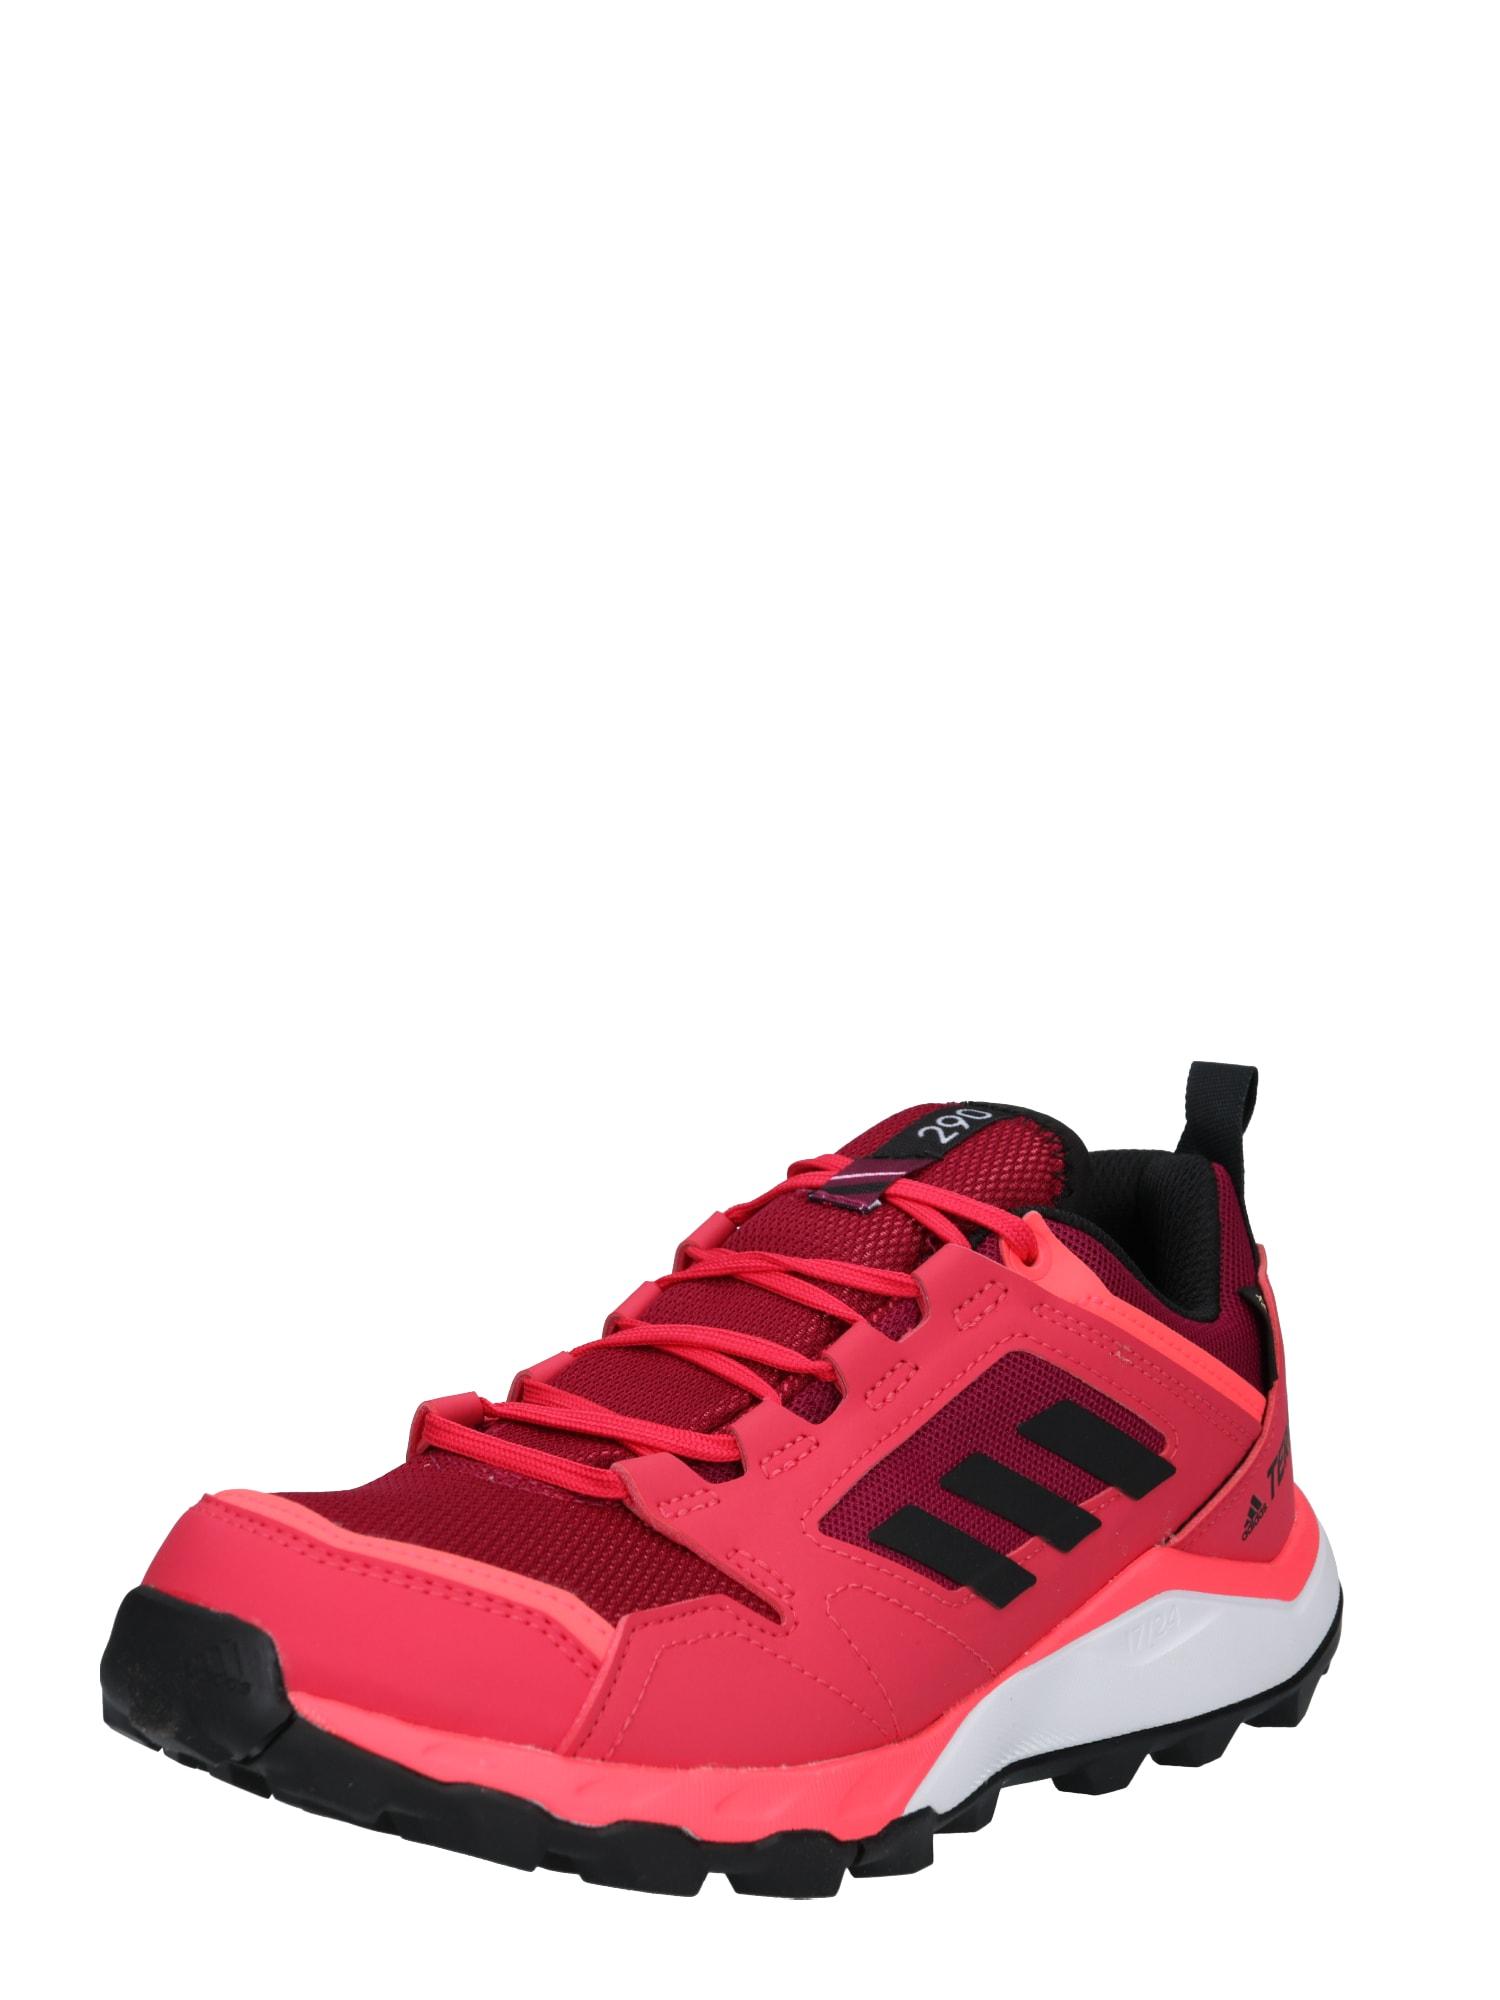 ADIDAS PERFORMANCE Sportovní boty 'Terrex Agravic TR G'  pink